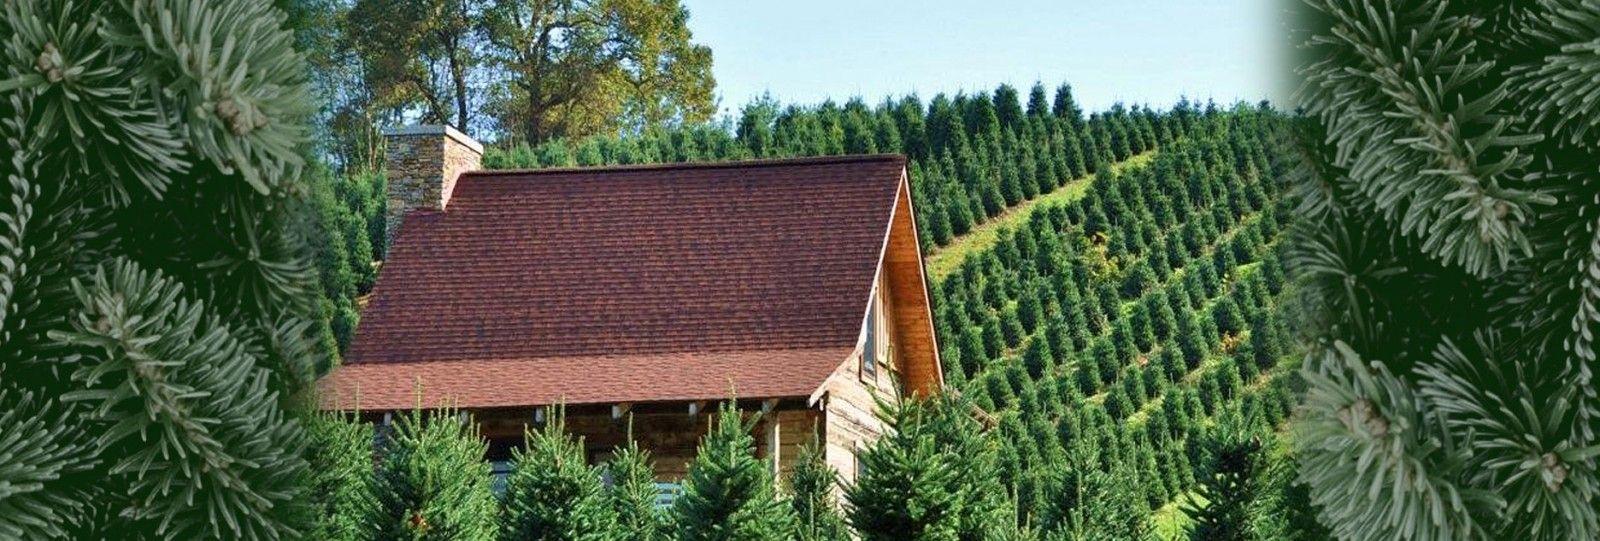 Boyd Mountain Christmas Tree Farm Christmas Tree Farm Tree Farms Colorado Blue Spruce